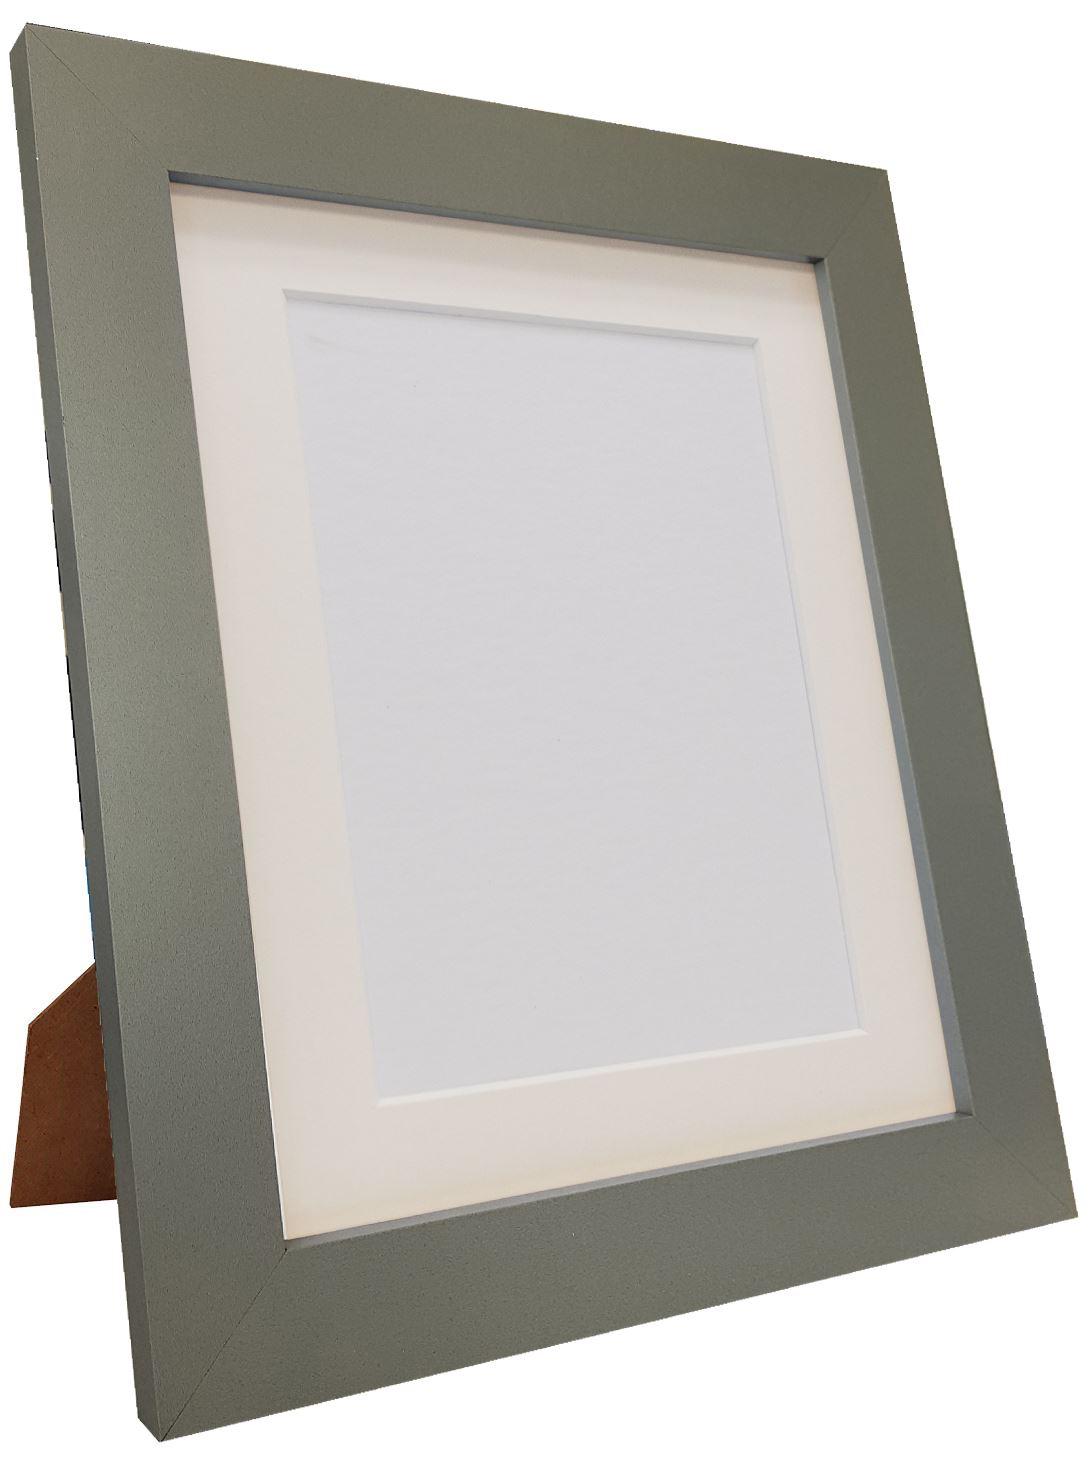 Metro Dark Grey Picture Photo Frame With Black White Or Ivory Mount